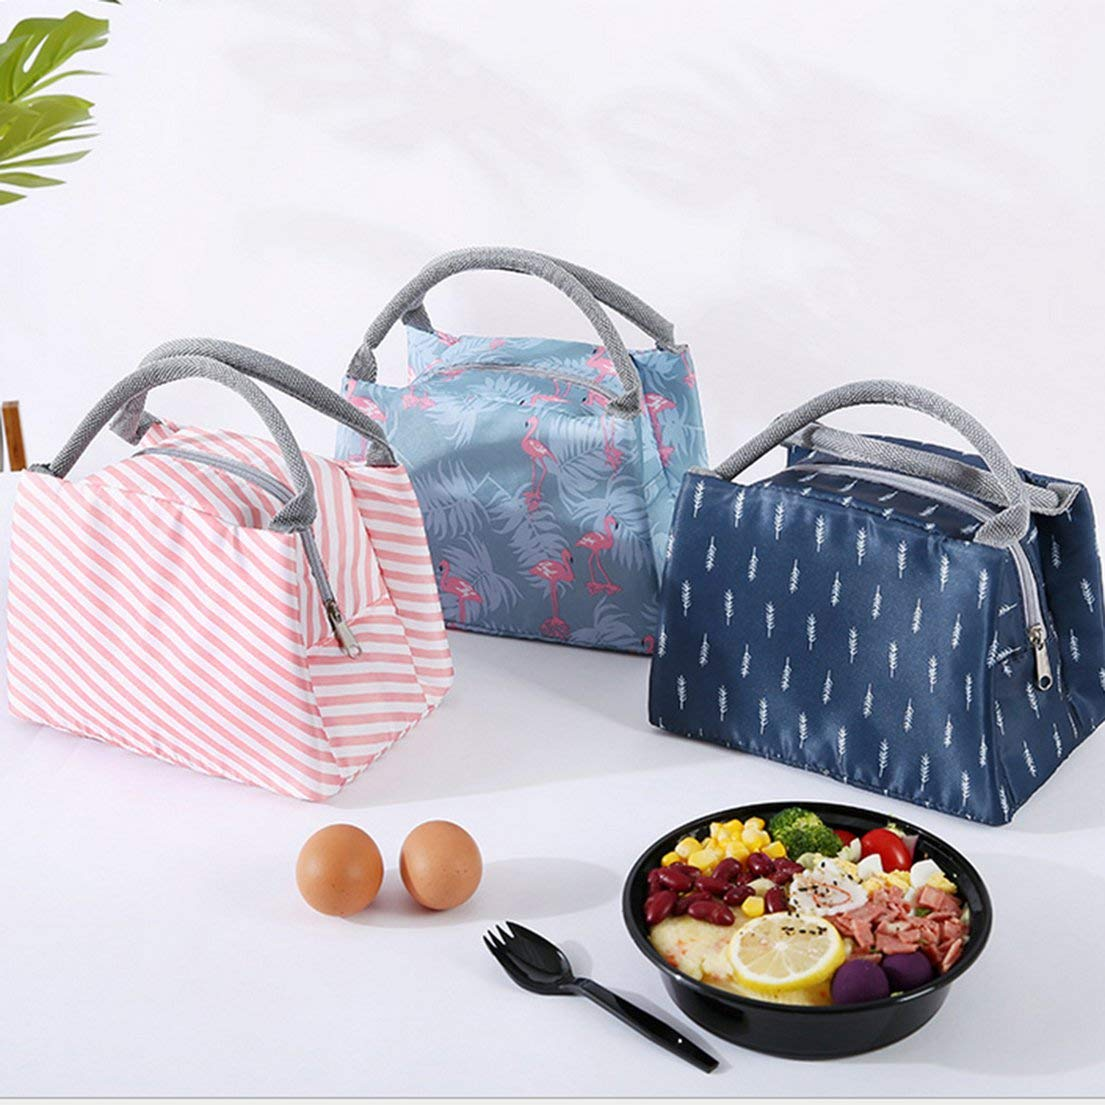 Bolsa de almuerzo para picnic al aire libre con forro de aluminio aislante t/érmico Leoboone bolsa de almuerzo port/átil para hielo